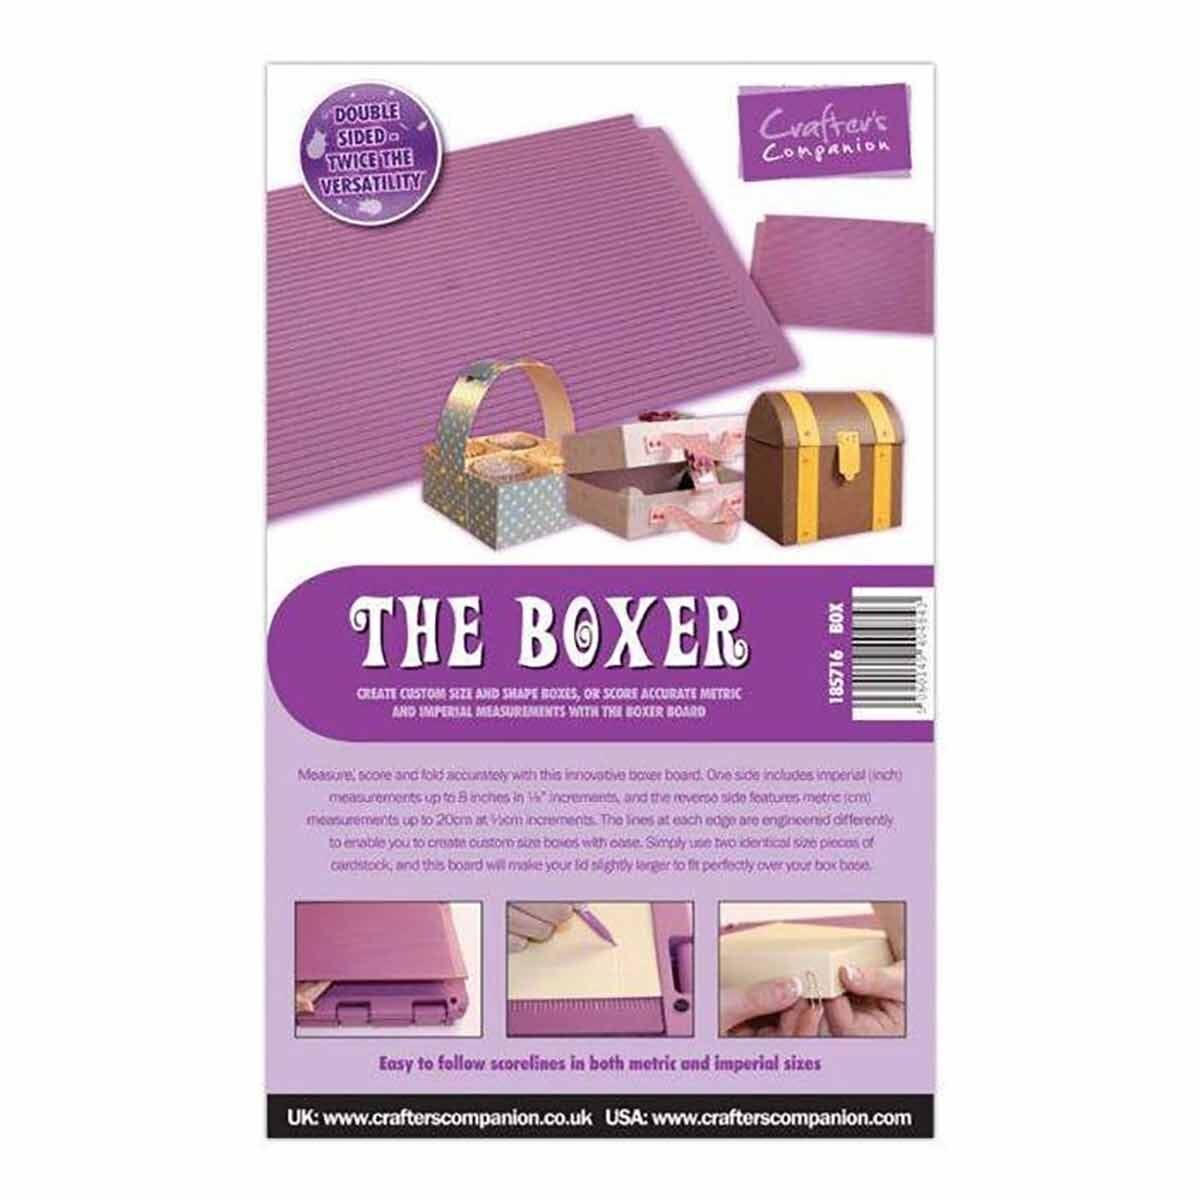 Crafters Companion The Boxer Board